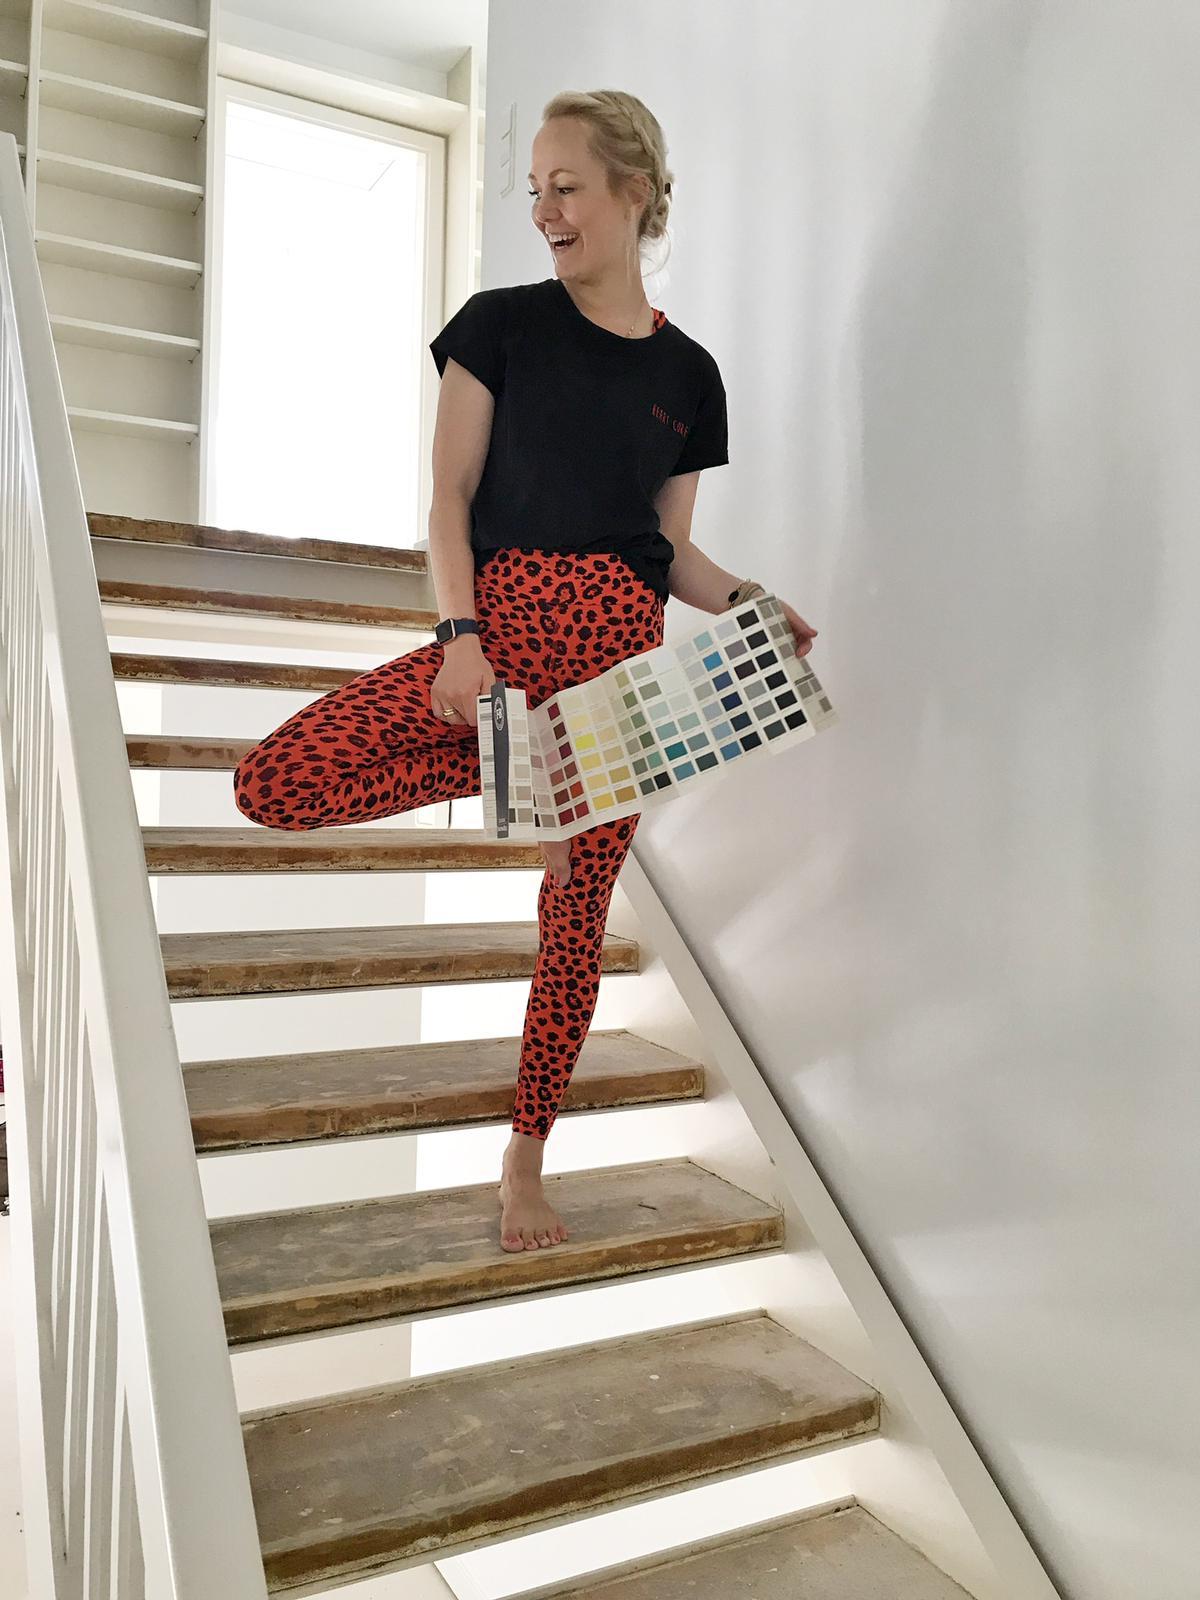 Kate gelinsky Glitter Haus Image 2018-10-19 at 00.48.16